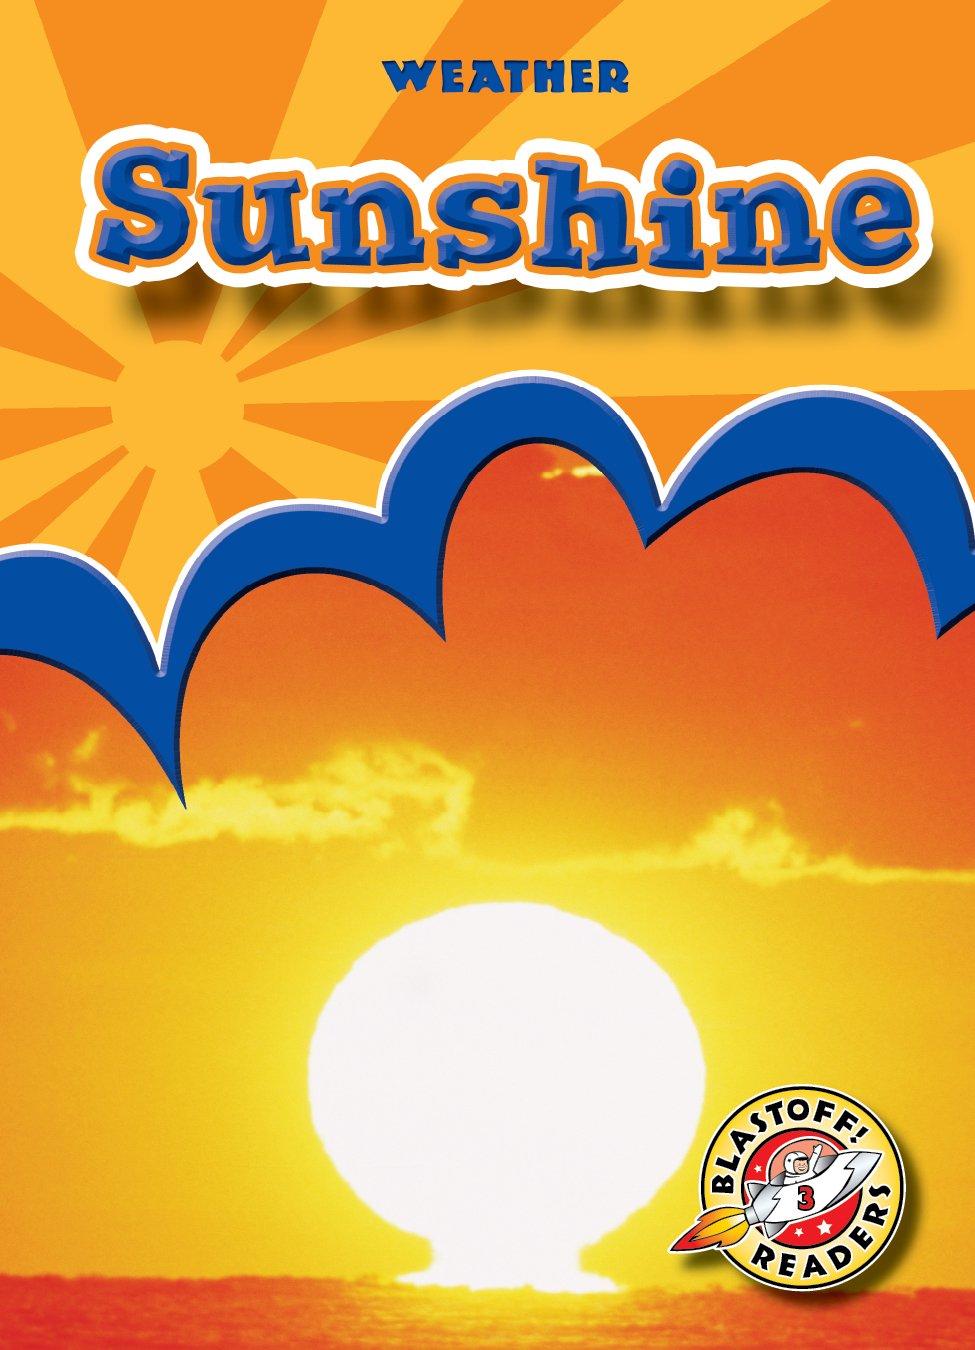 Sunshine (Paperback)(Blastoff! Readers: Weather) (Weather: Blastoff Readers, Level 3) PDF